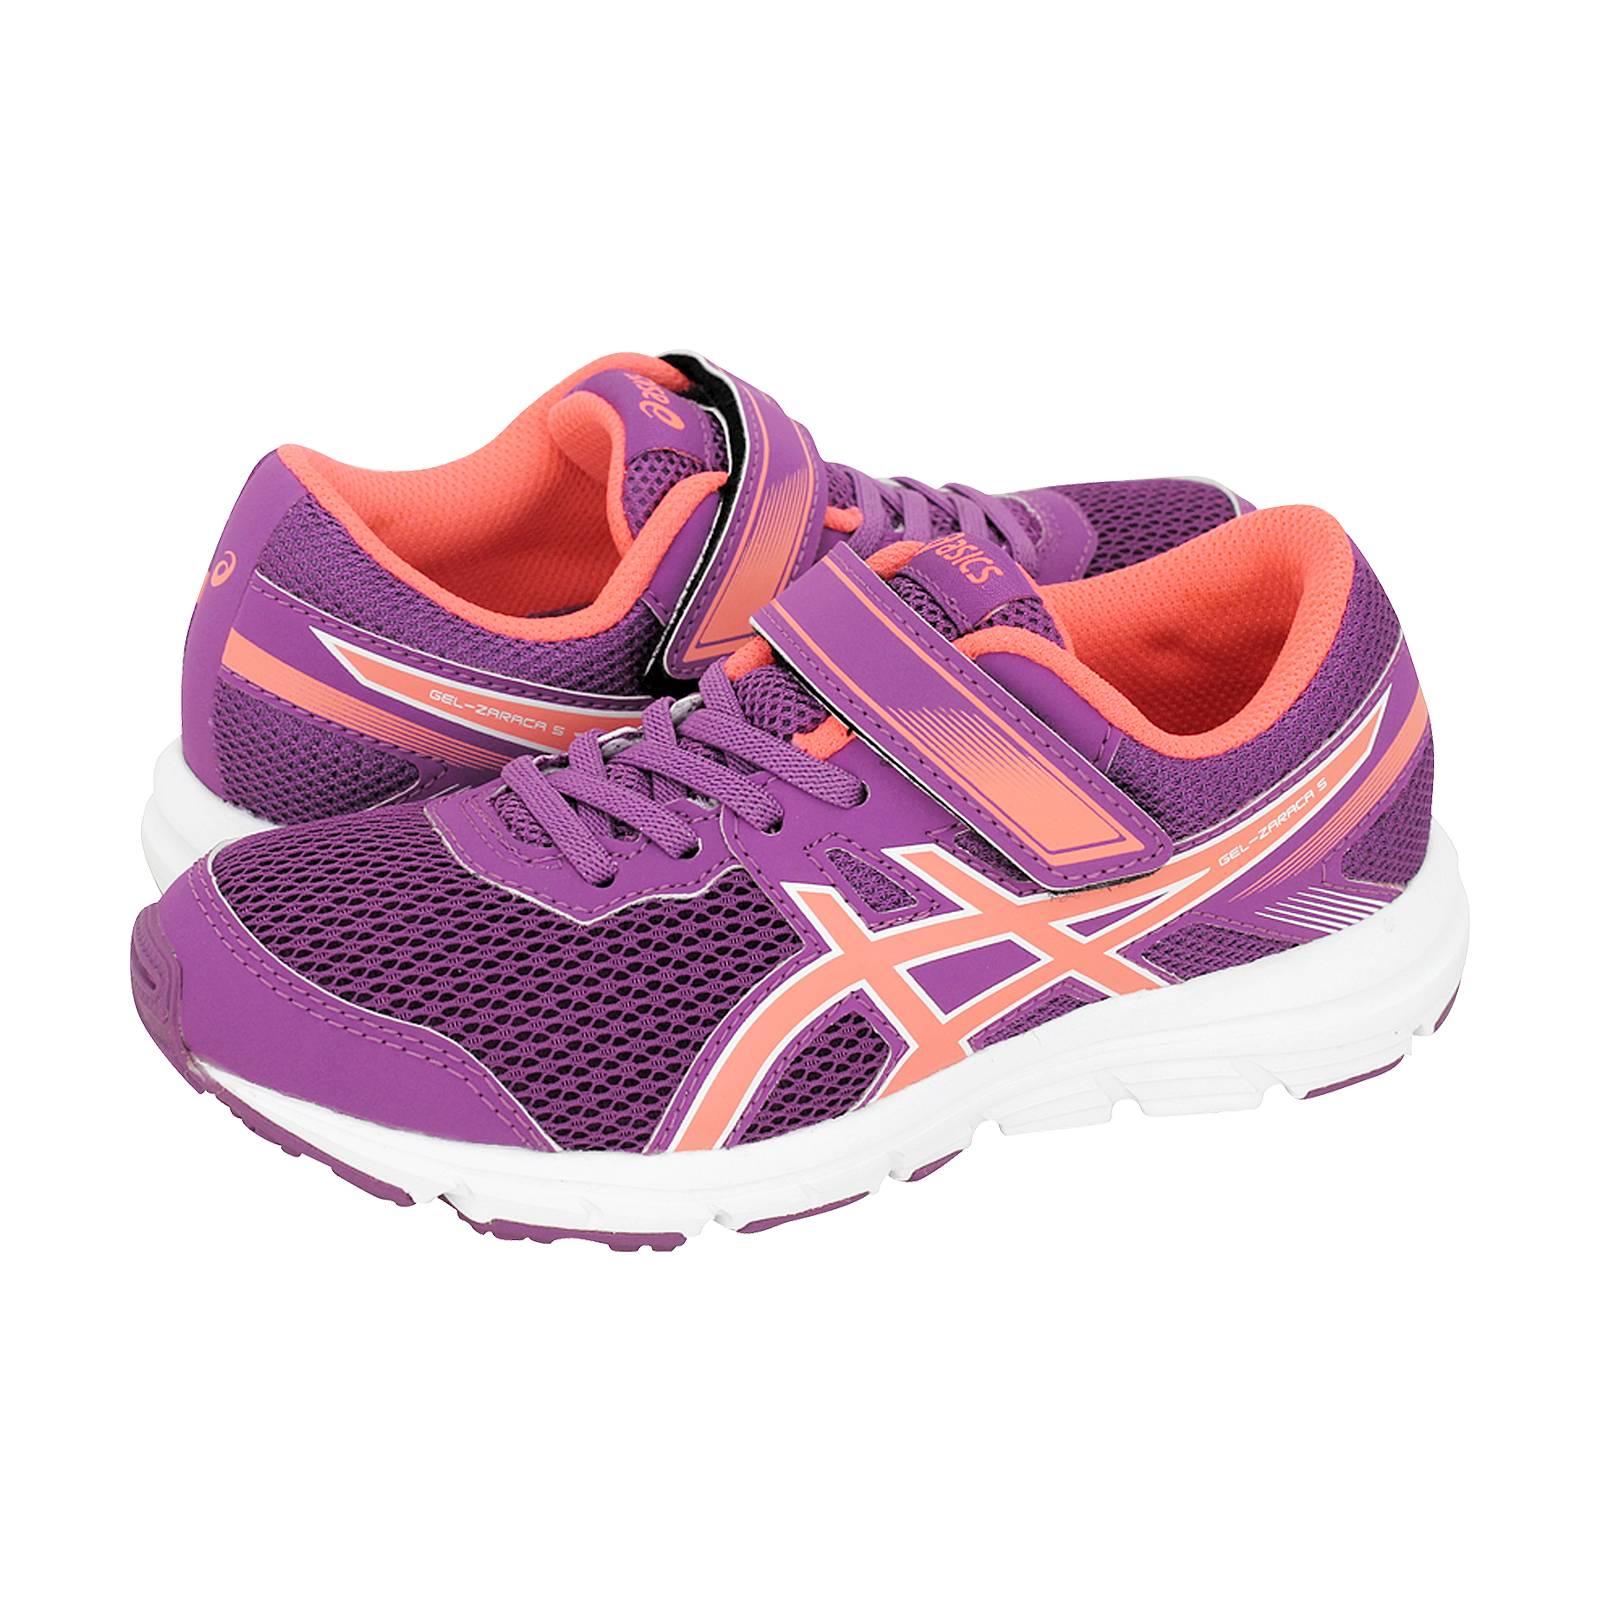 Gel Zaraca PS 5 tissu PS Asics Athletic Chaussures enfants en en tissu et f476efc - resepmasakannusantara.website